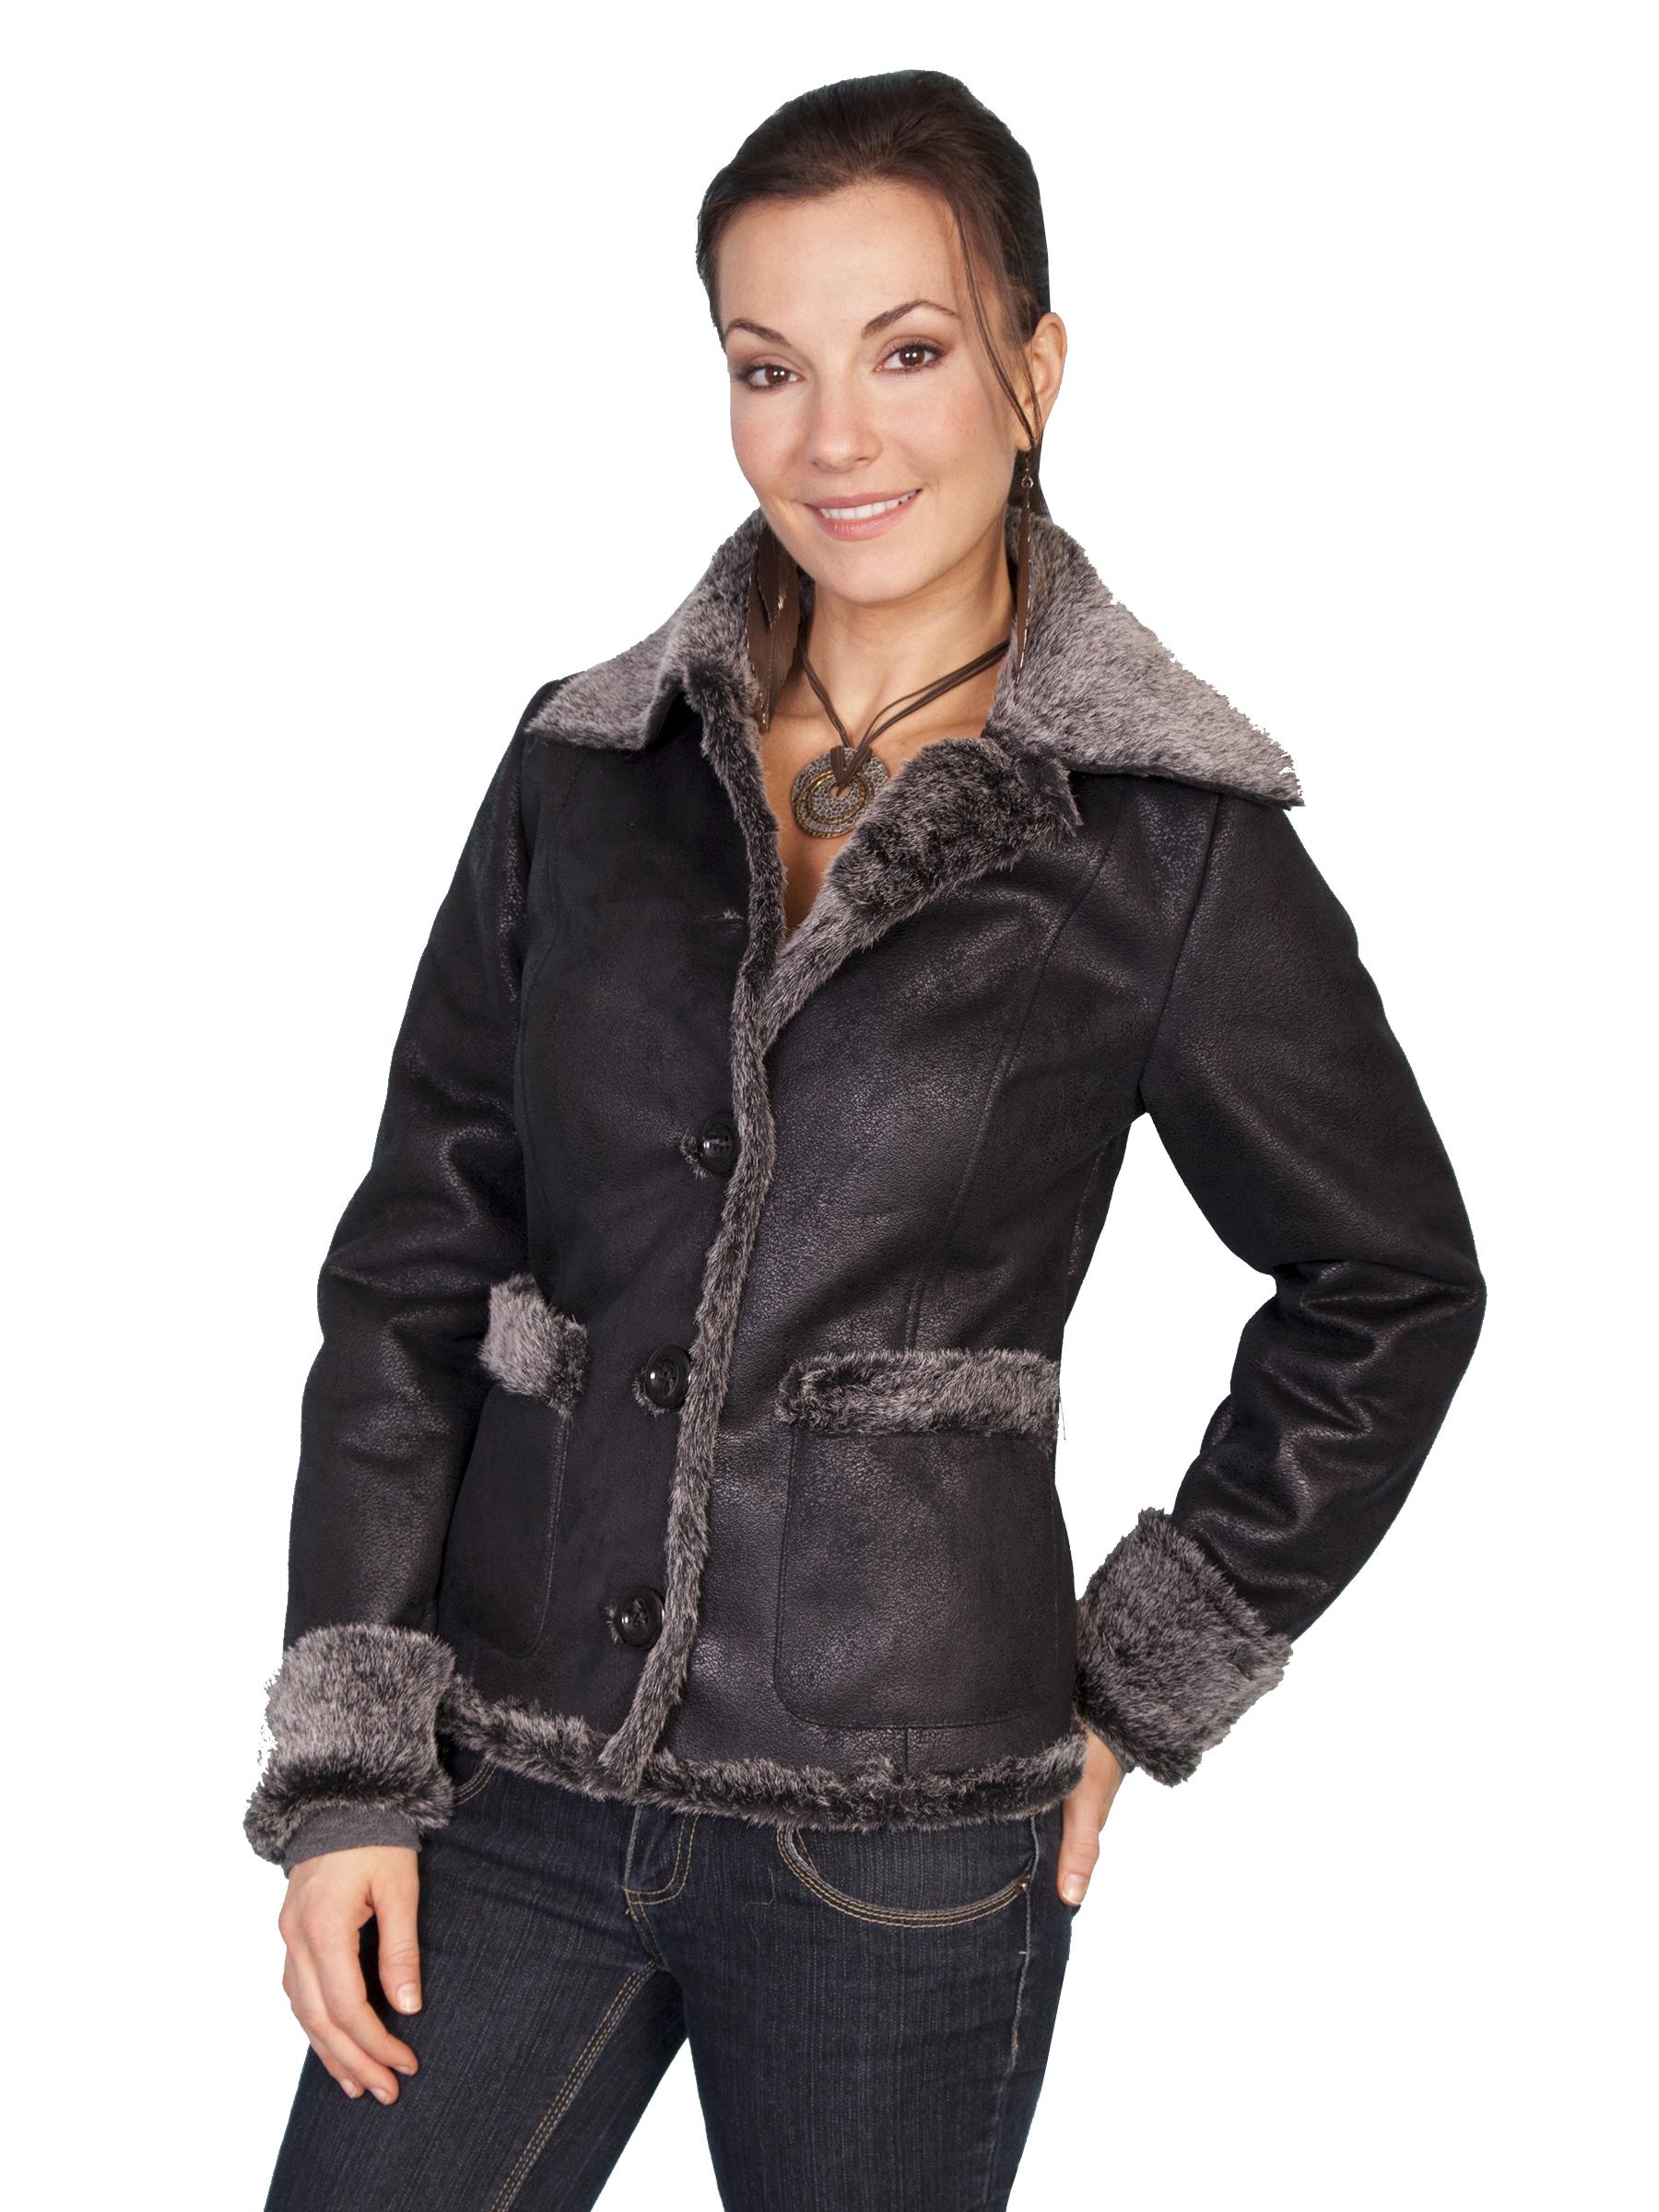 Fashionable faux fur jacket